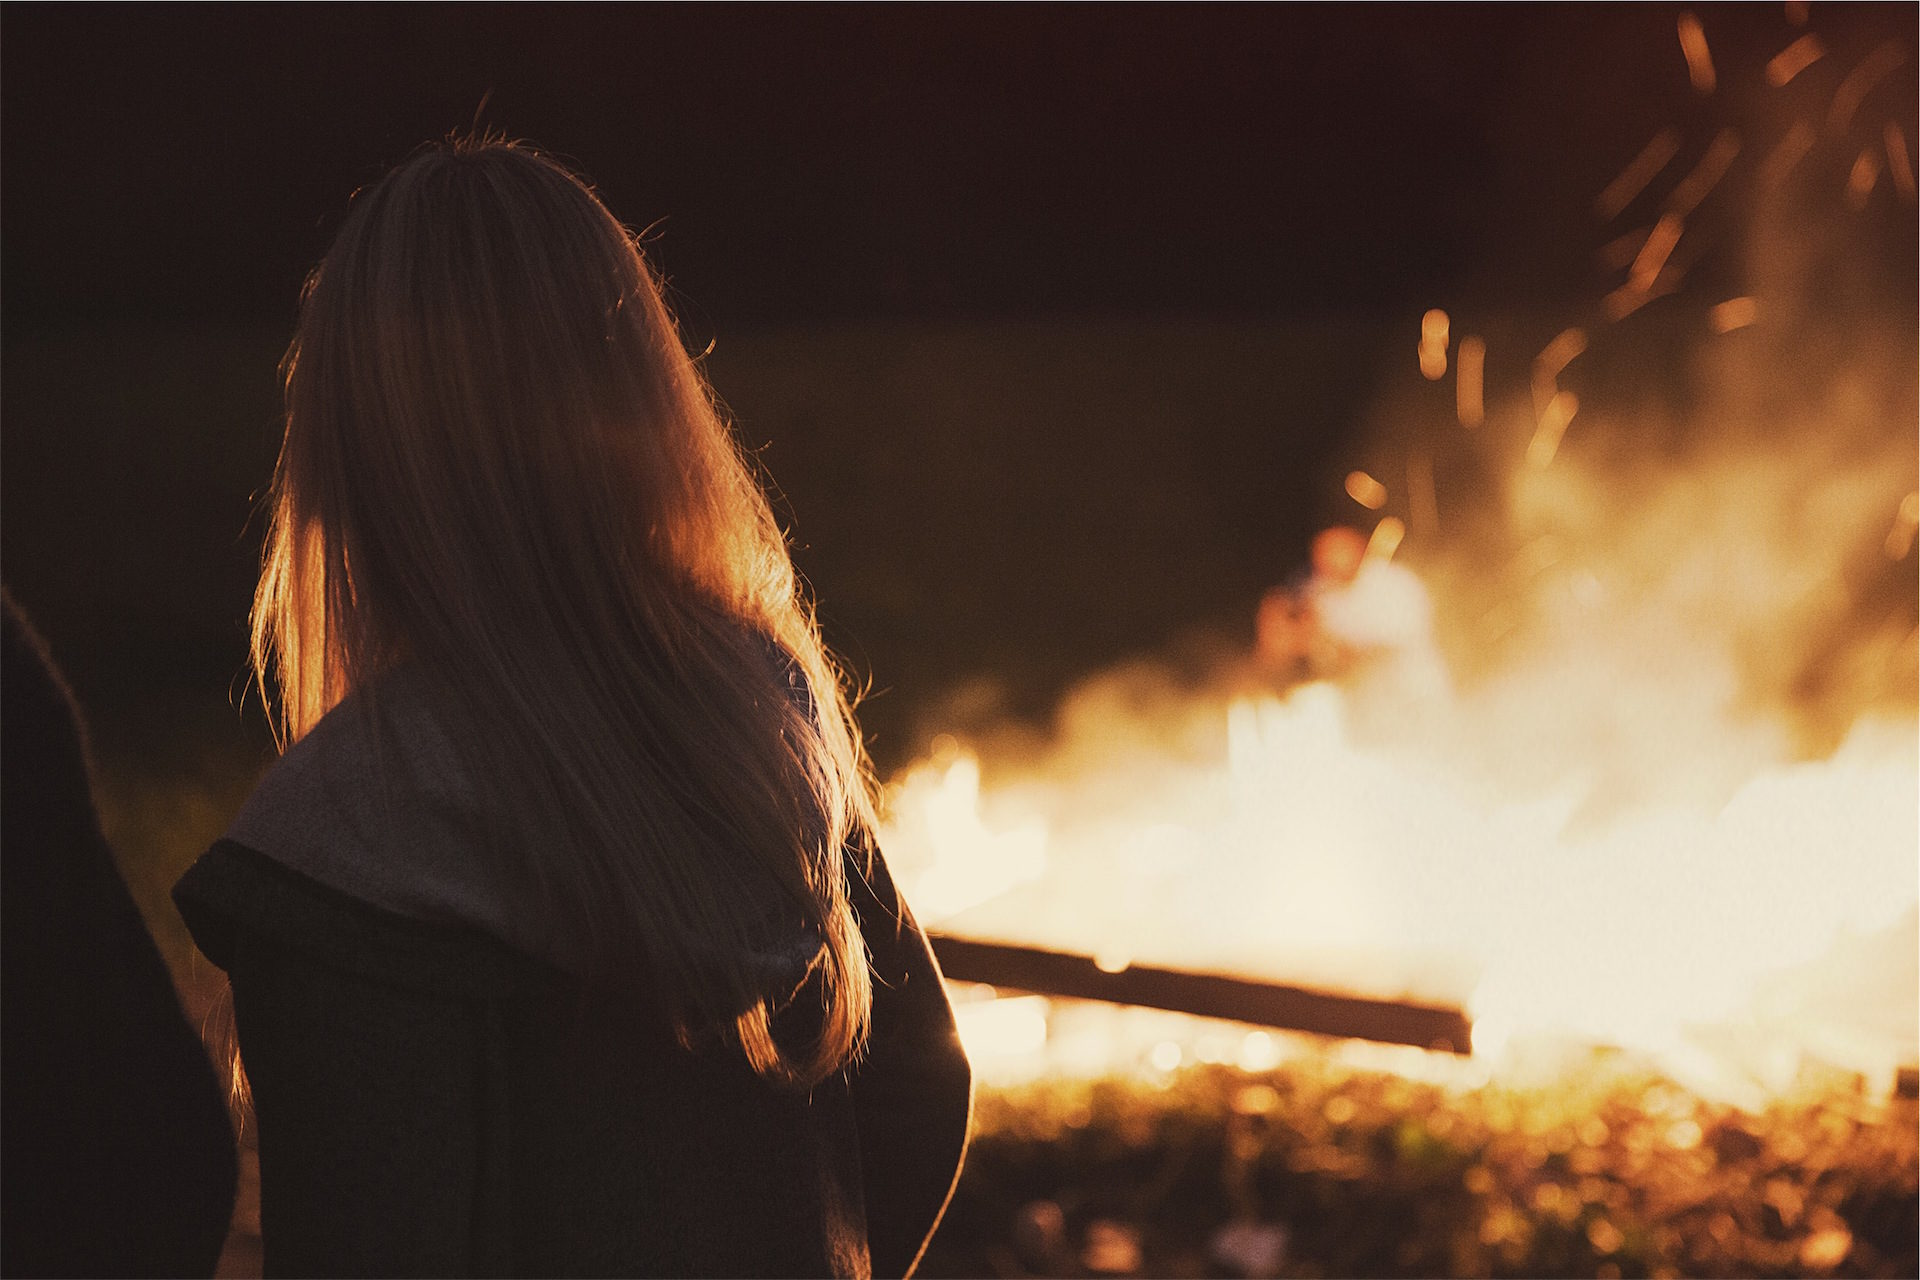 fogueira, fogo, mulher, Camisola, à noite - Papéis de parede HD - Professor-falken.com